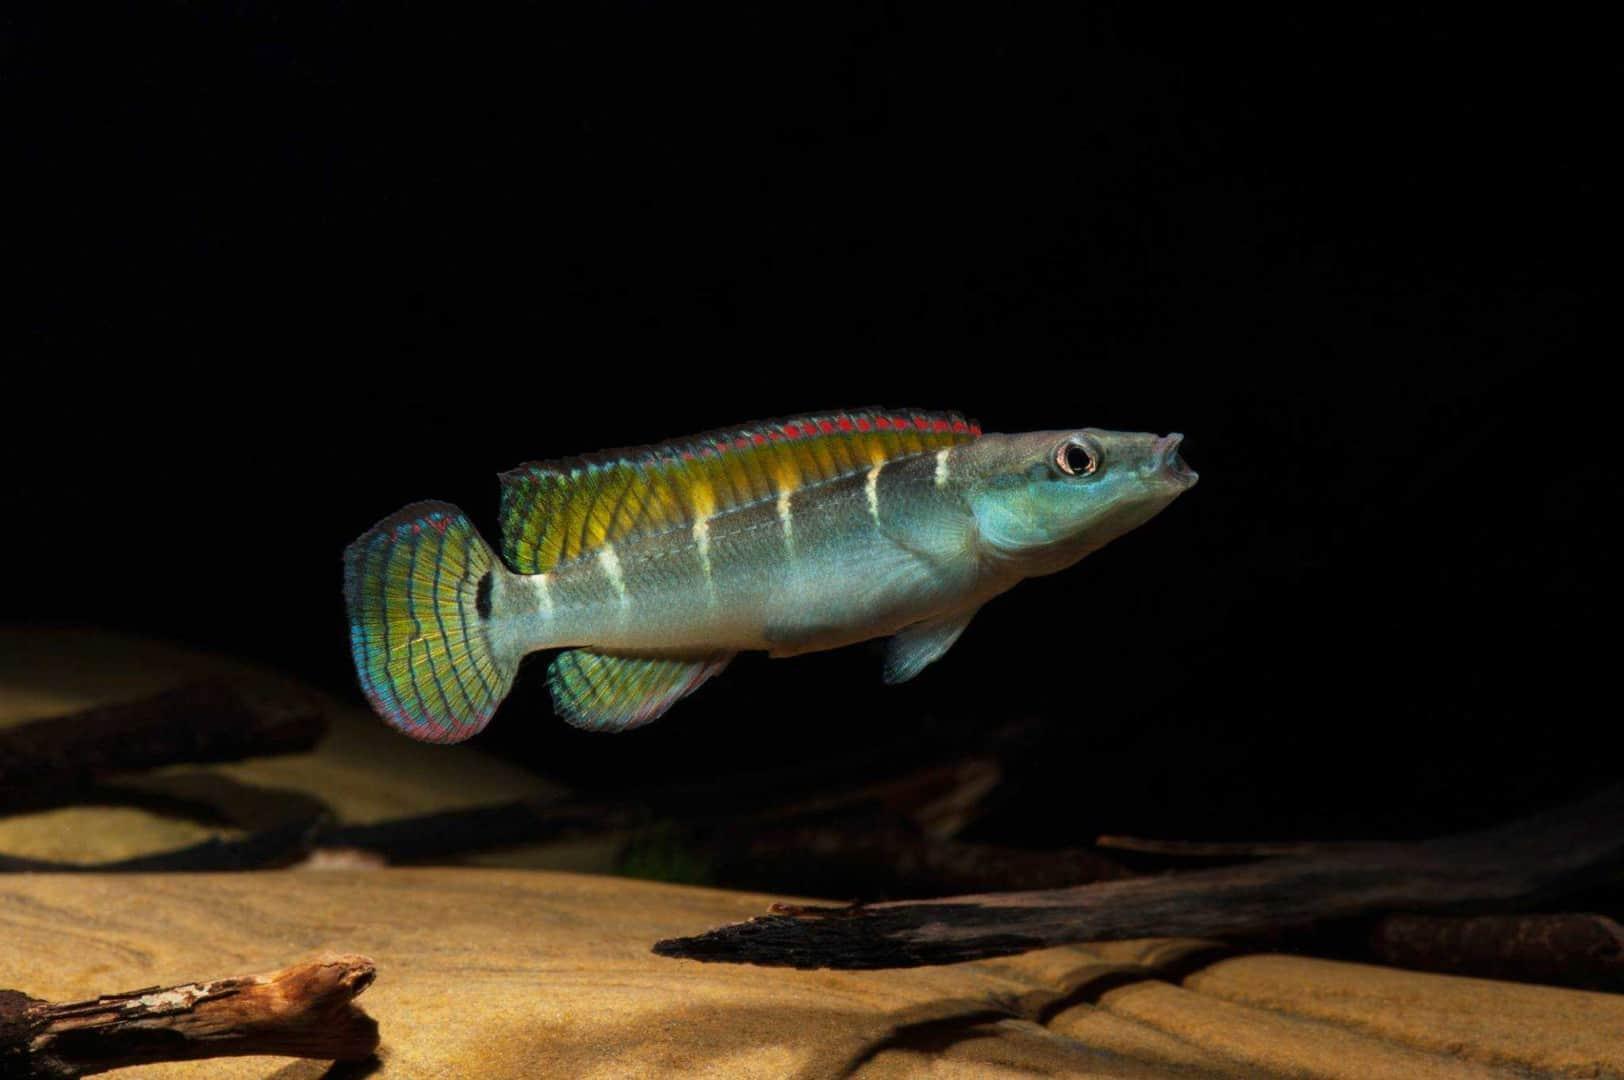 Crenicichla compressiceps Wf Brasilien 6-7cm - Quelle: Aqua Global